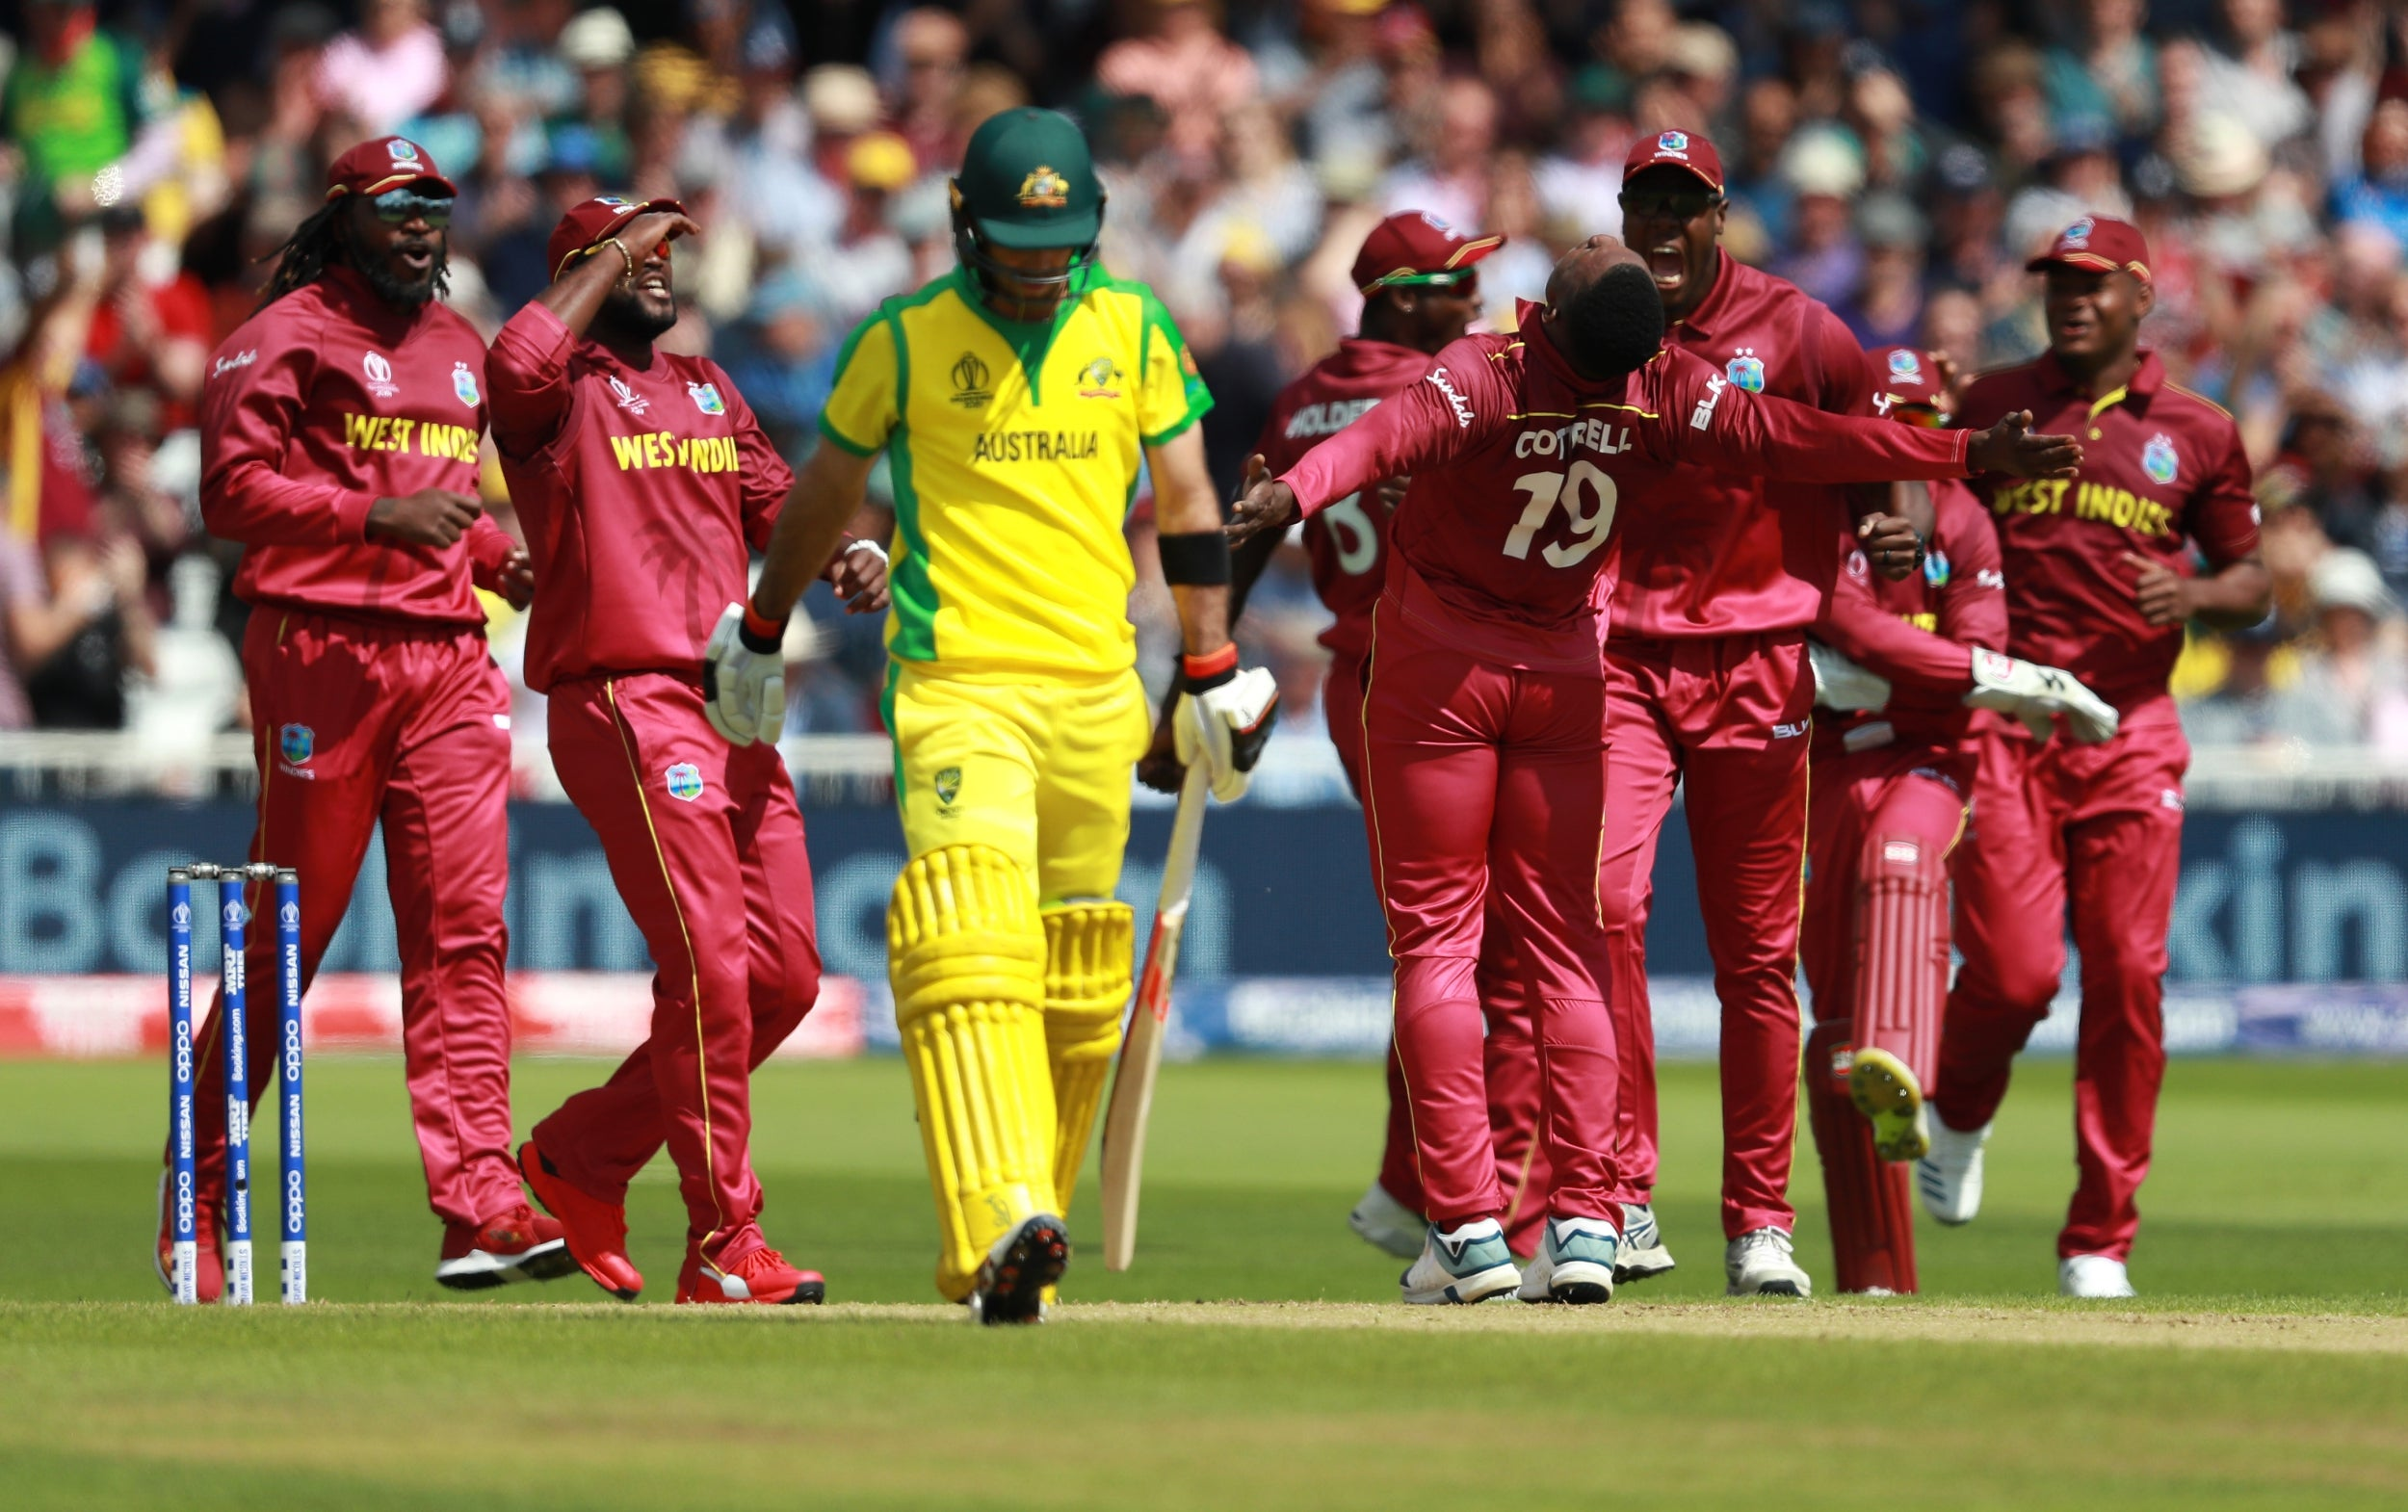 England vs New Zealand live stream: Free 2019 Cricket World Cup